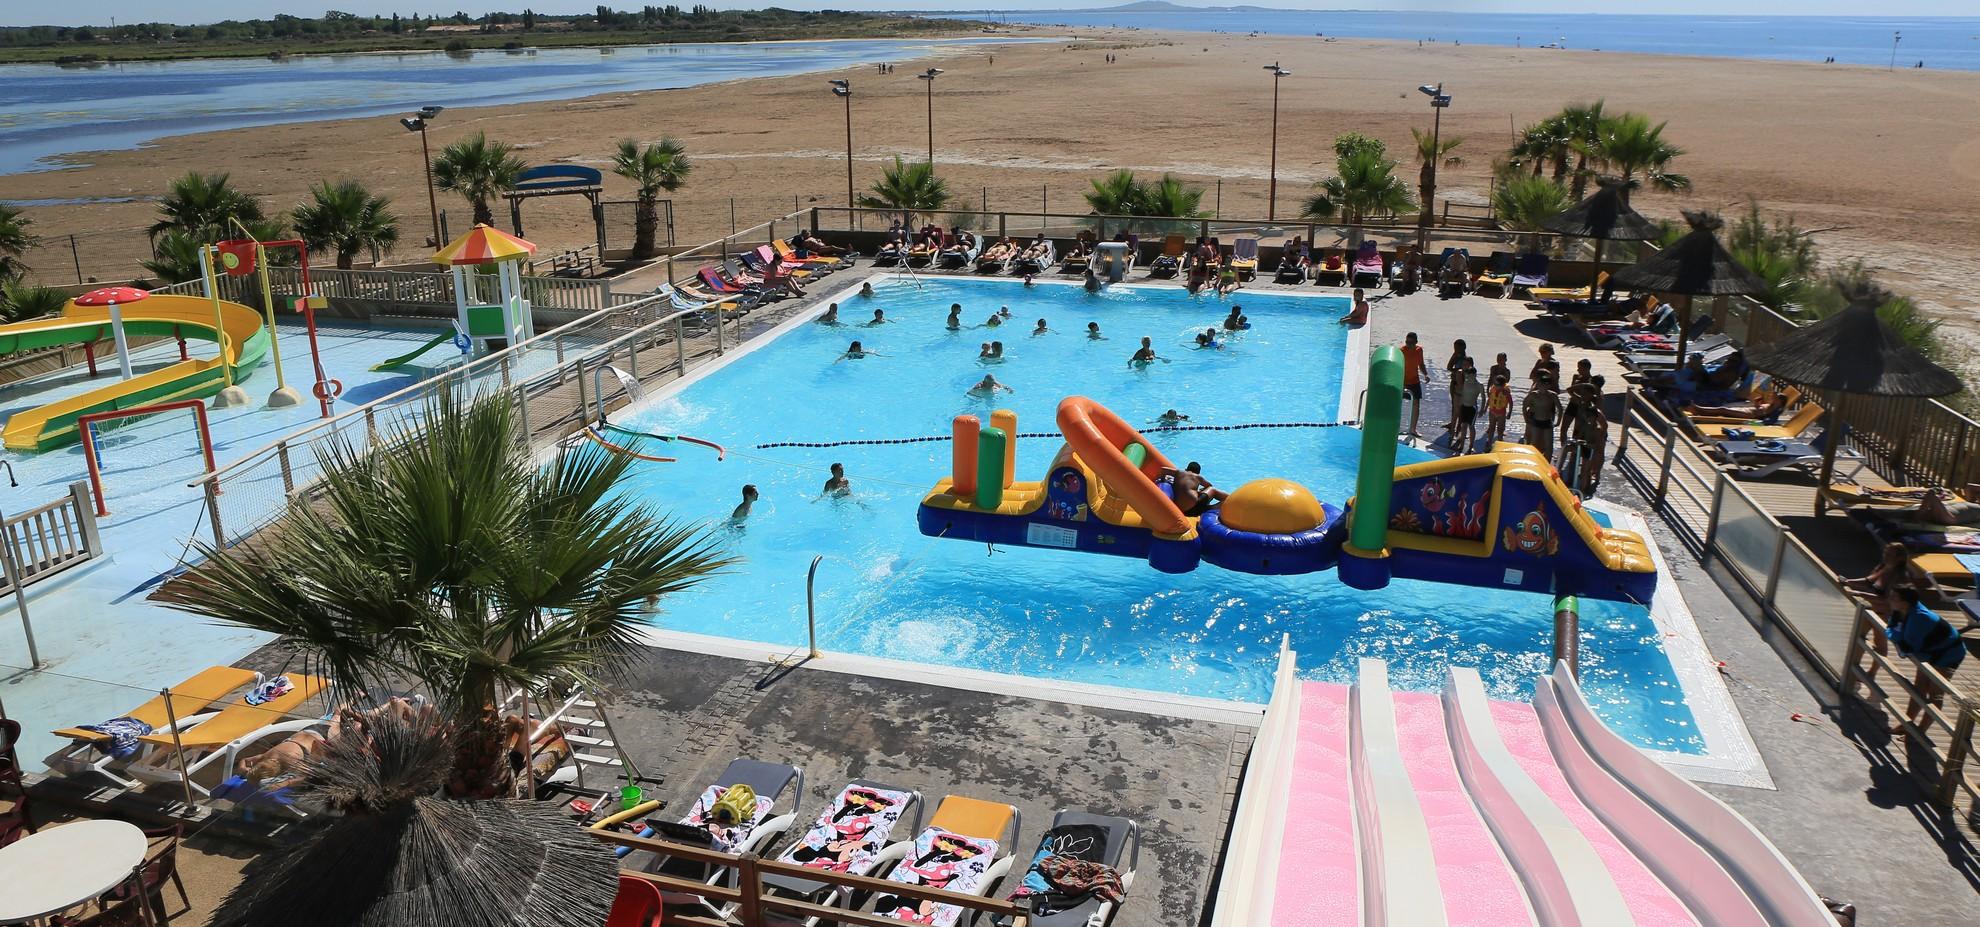 Le camping bleu marine s rignan plage sud france for Camping sud france avec piscine